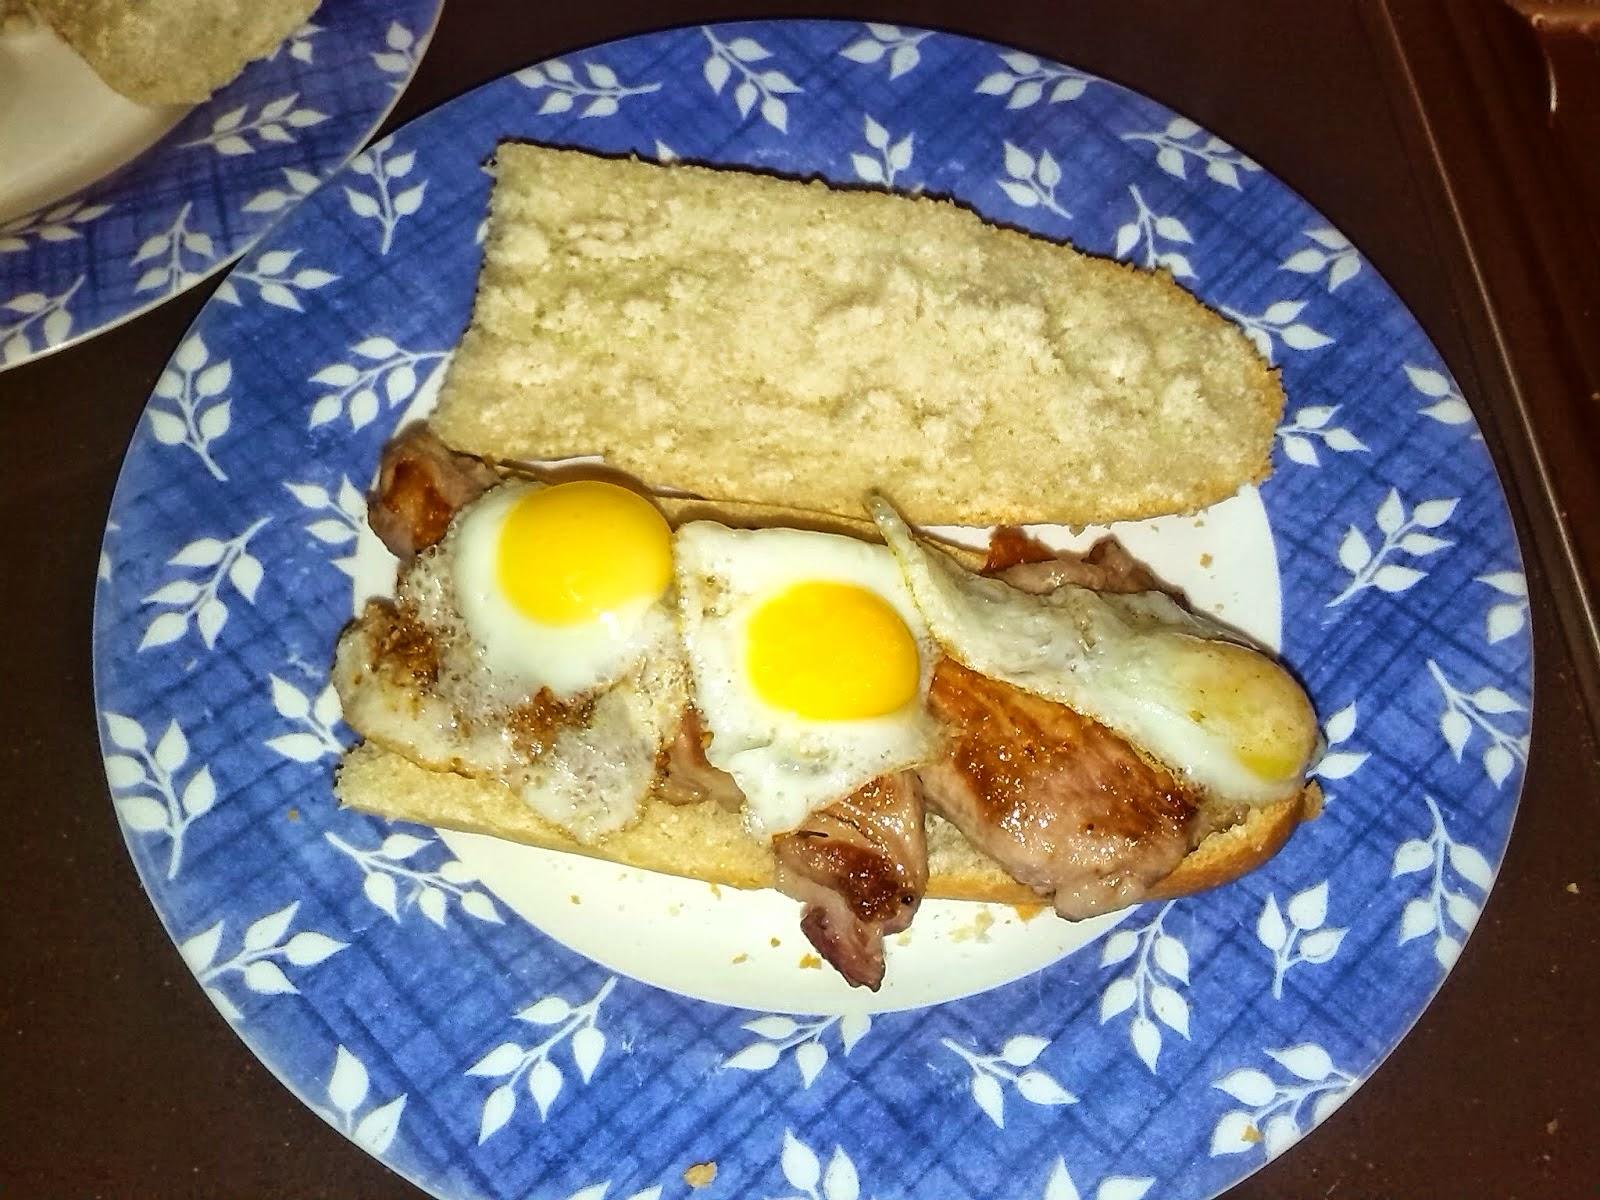 http://lashermanasyunamarx.blogspot.com.es/2014/03/bocata-de-secreto-iberico-y-huevos-de.html